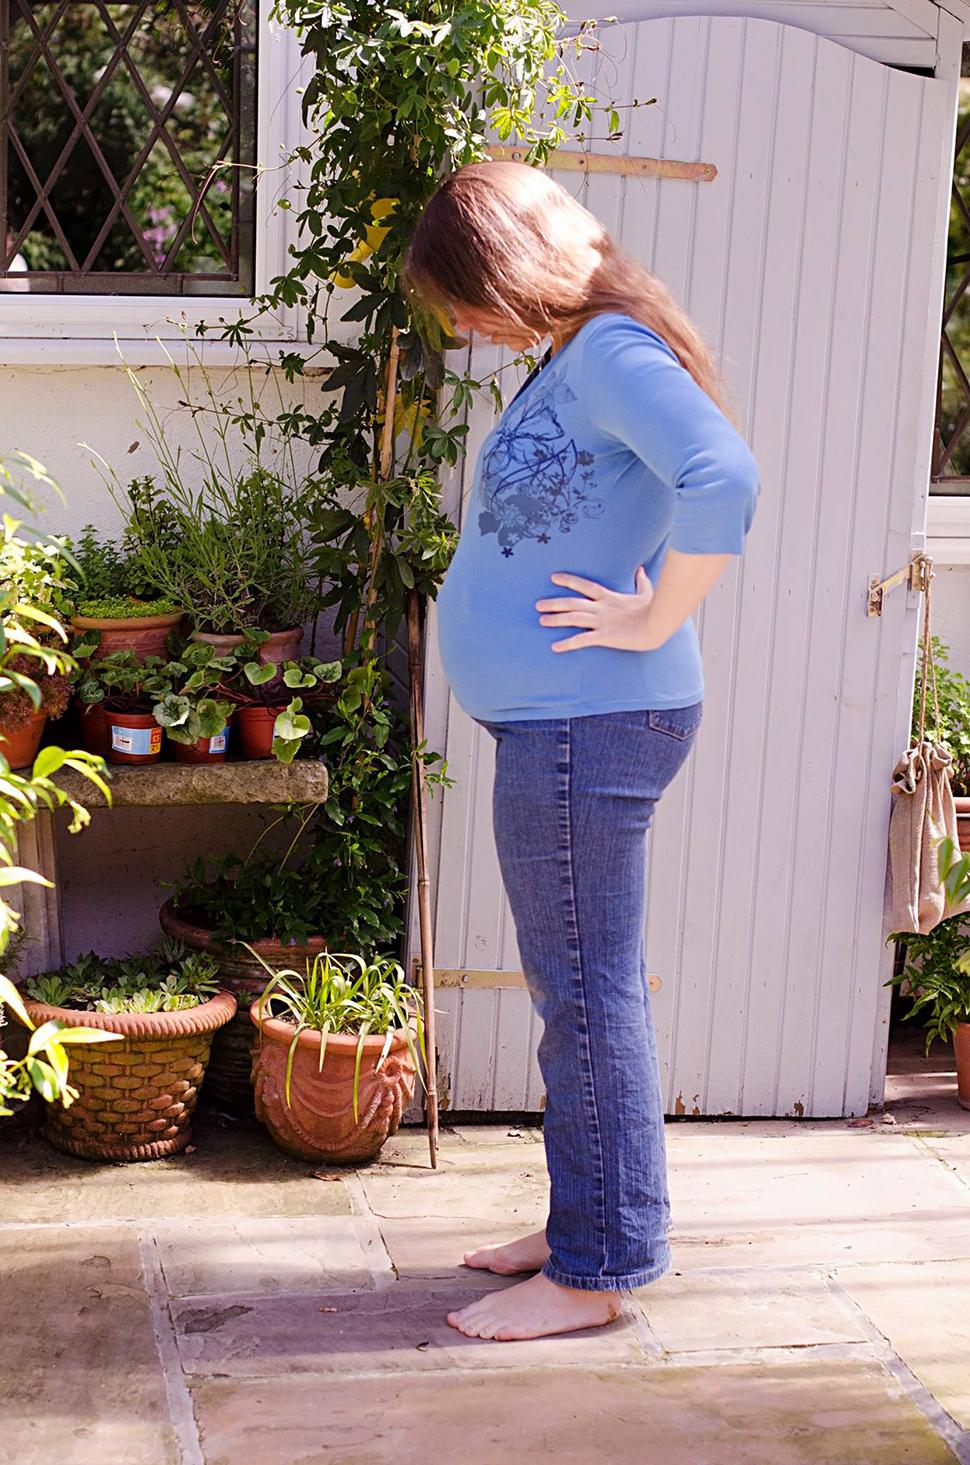 17 week twin pregnancy bump